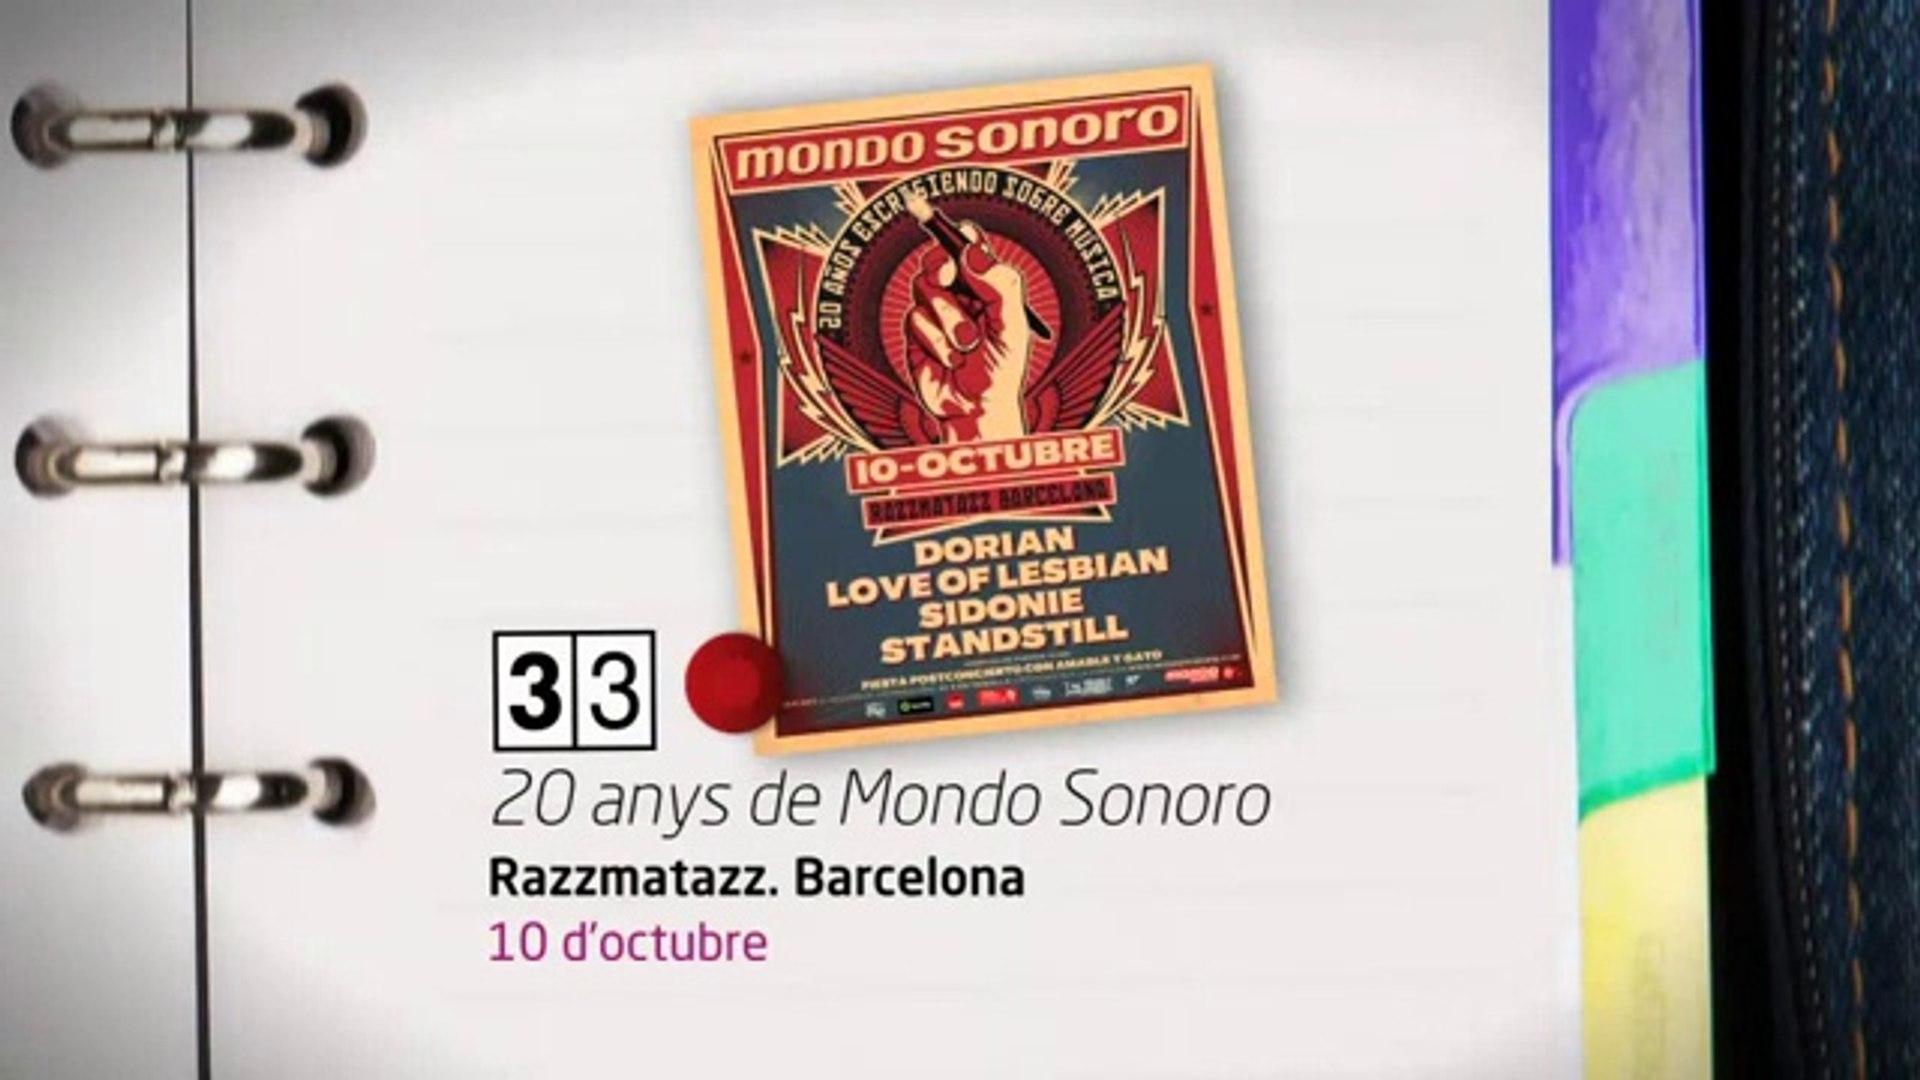 TV3 - 33 recomana - 20 anys de Mondo Sonoro. Razzmatazz. Barcelona